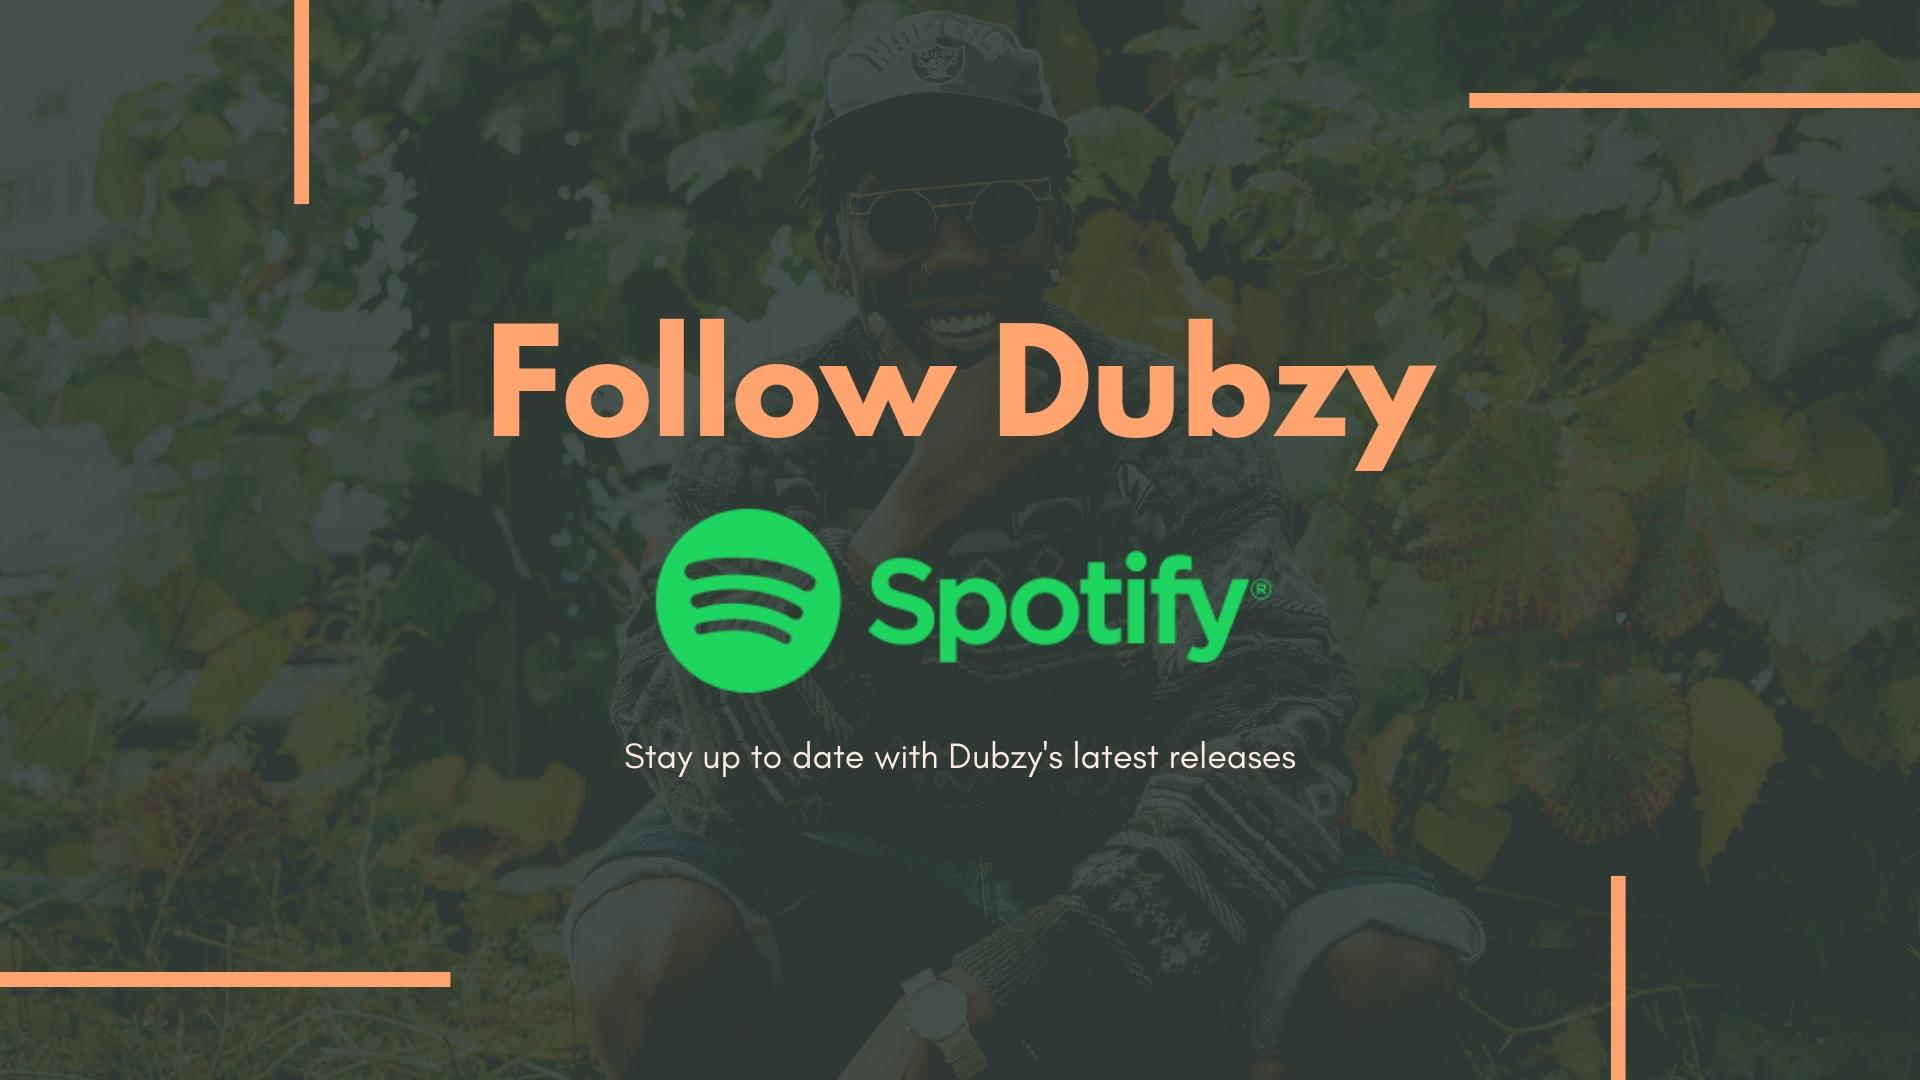 Follow Dubzy on Spotify.jpg